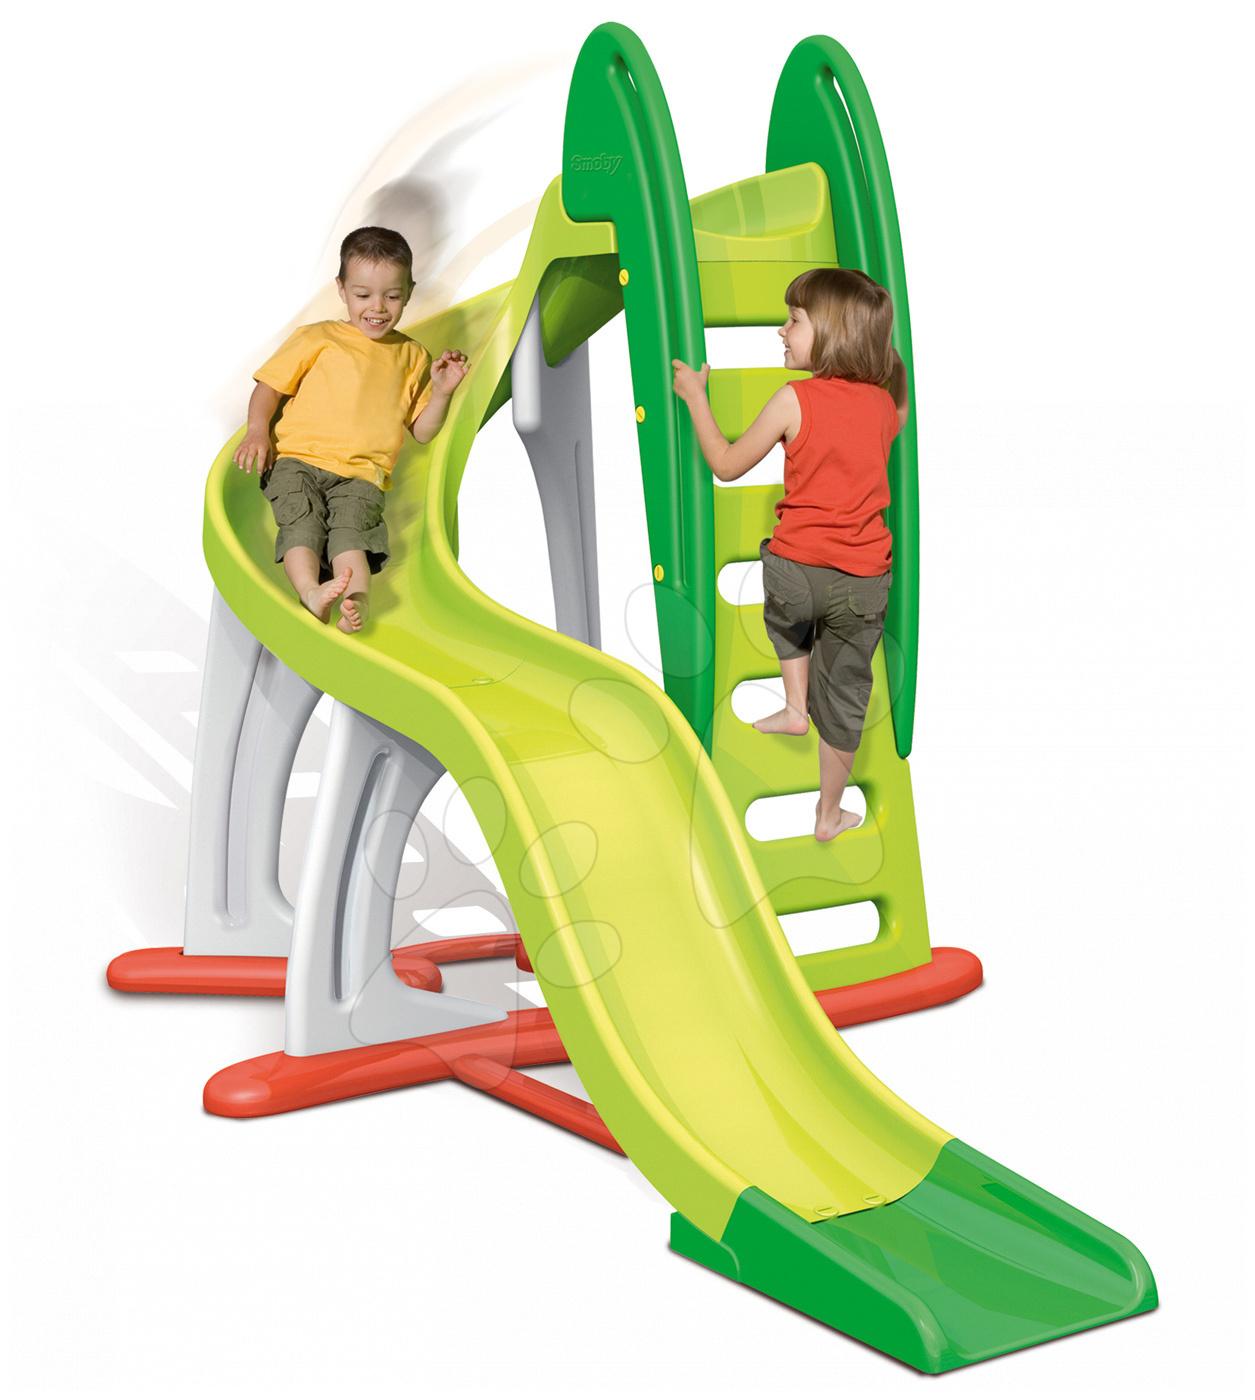 Tobogani za otroke - Tobogan U'Turn Smoby dolžina 3,8 m zelen